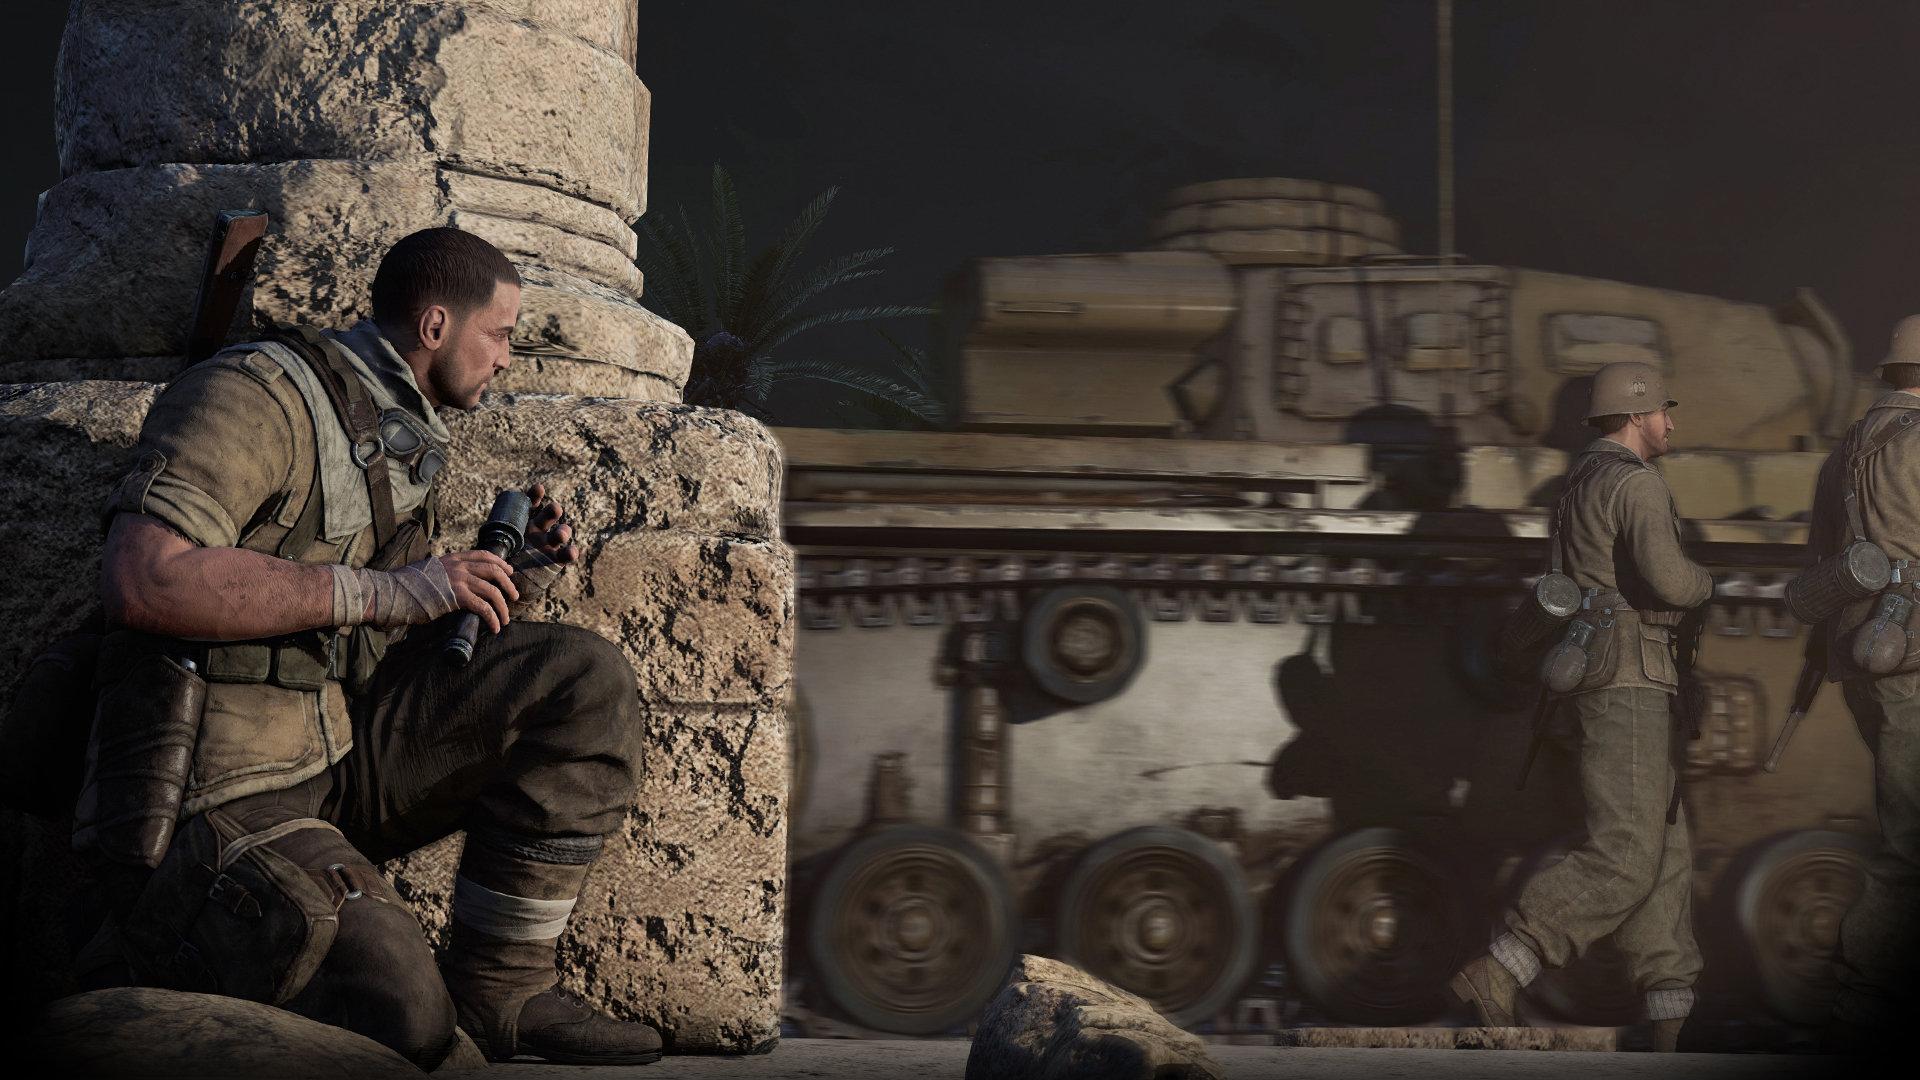 sniper-elite-3-screenshot-10-ps4-us-12ju